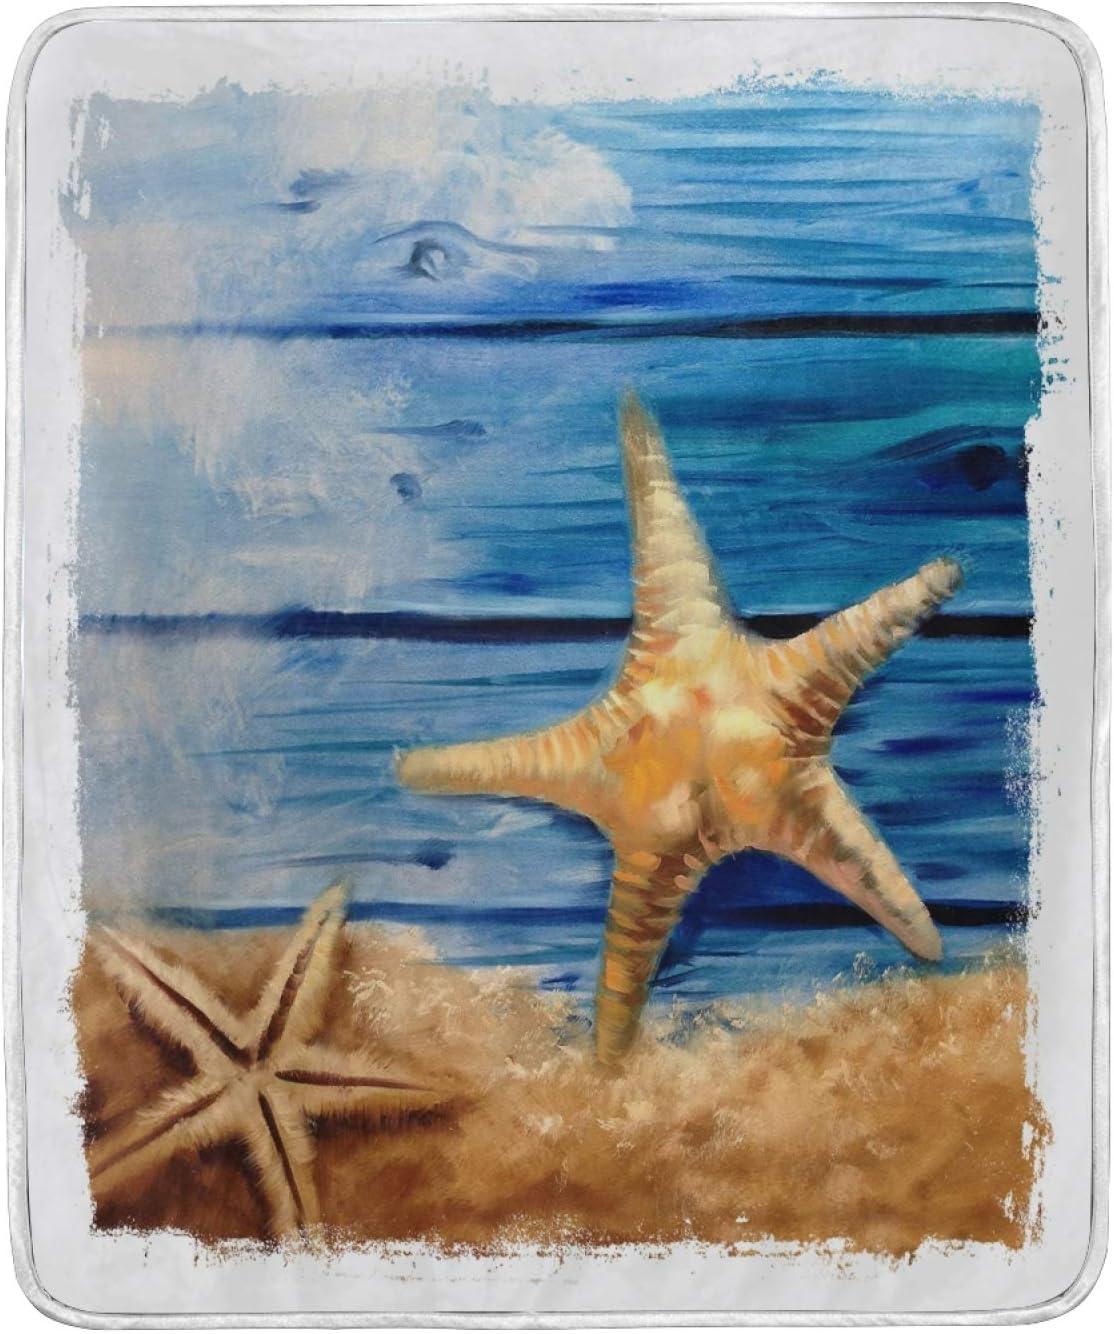 NOVTO Throw Philadelphia Mall Genuine Blanket Ocean Sea Starfish Blankets Supe Soft Wooden